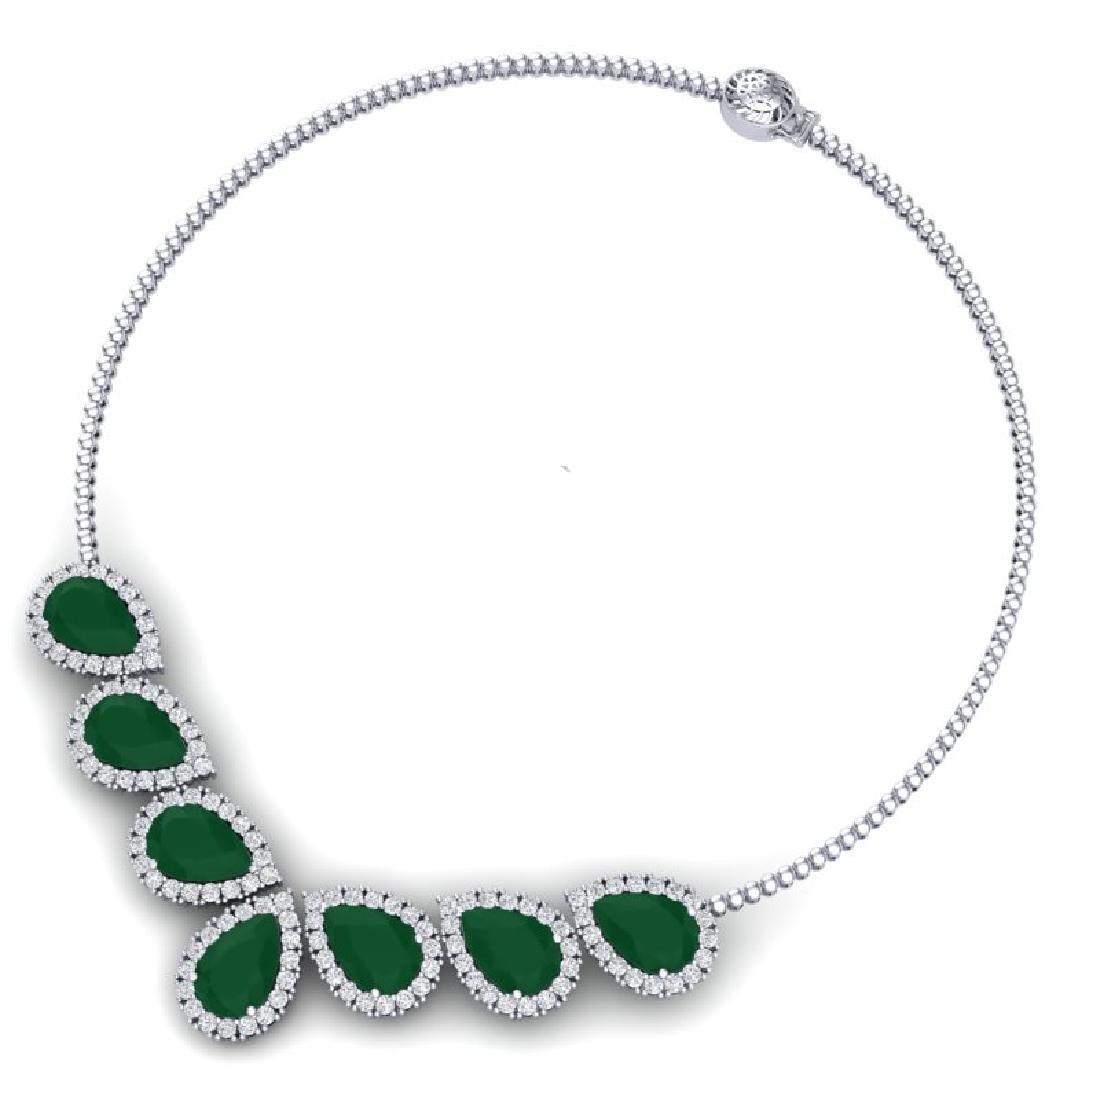 34.72 CTW Royalty Emerald & VS Diamond Necklace 18K - 3